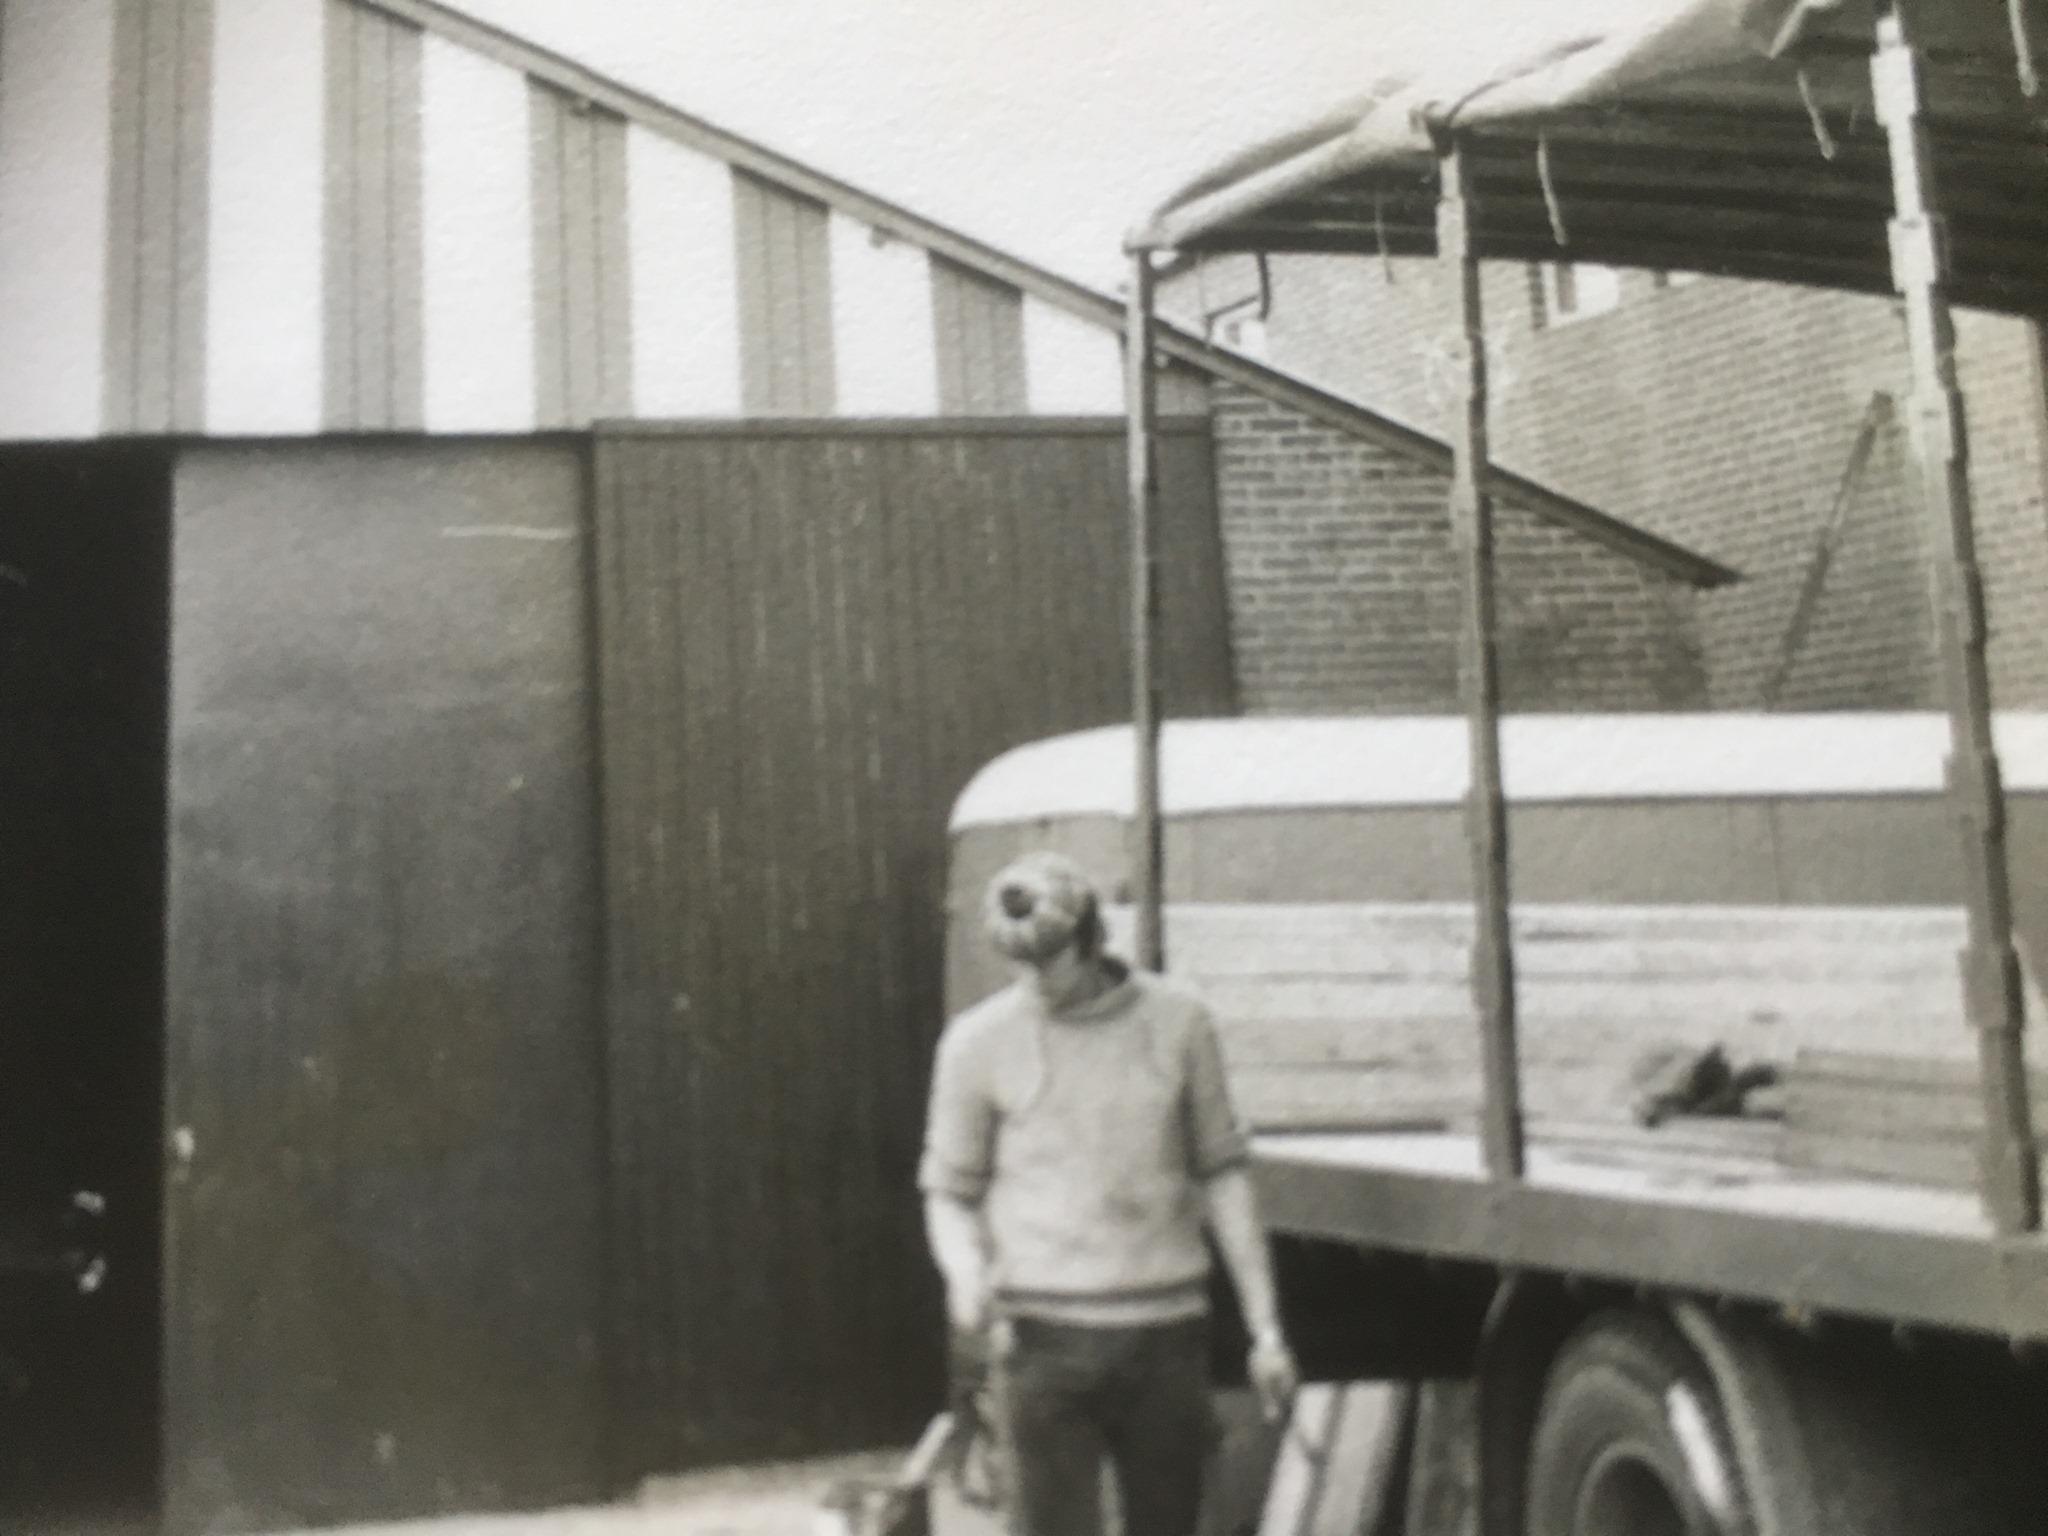 Piet-de-Boer-foto-archief-(1)